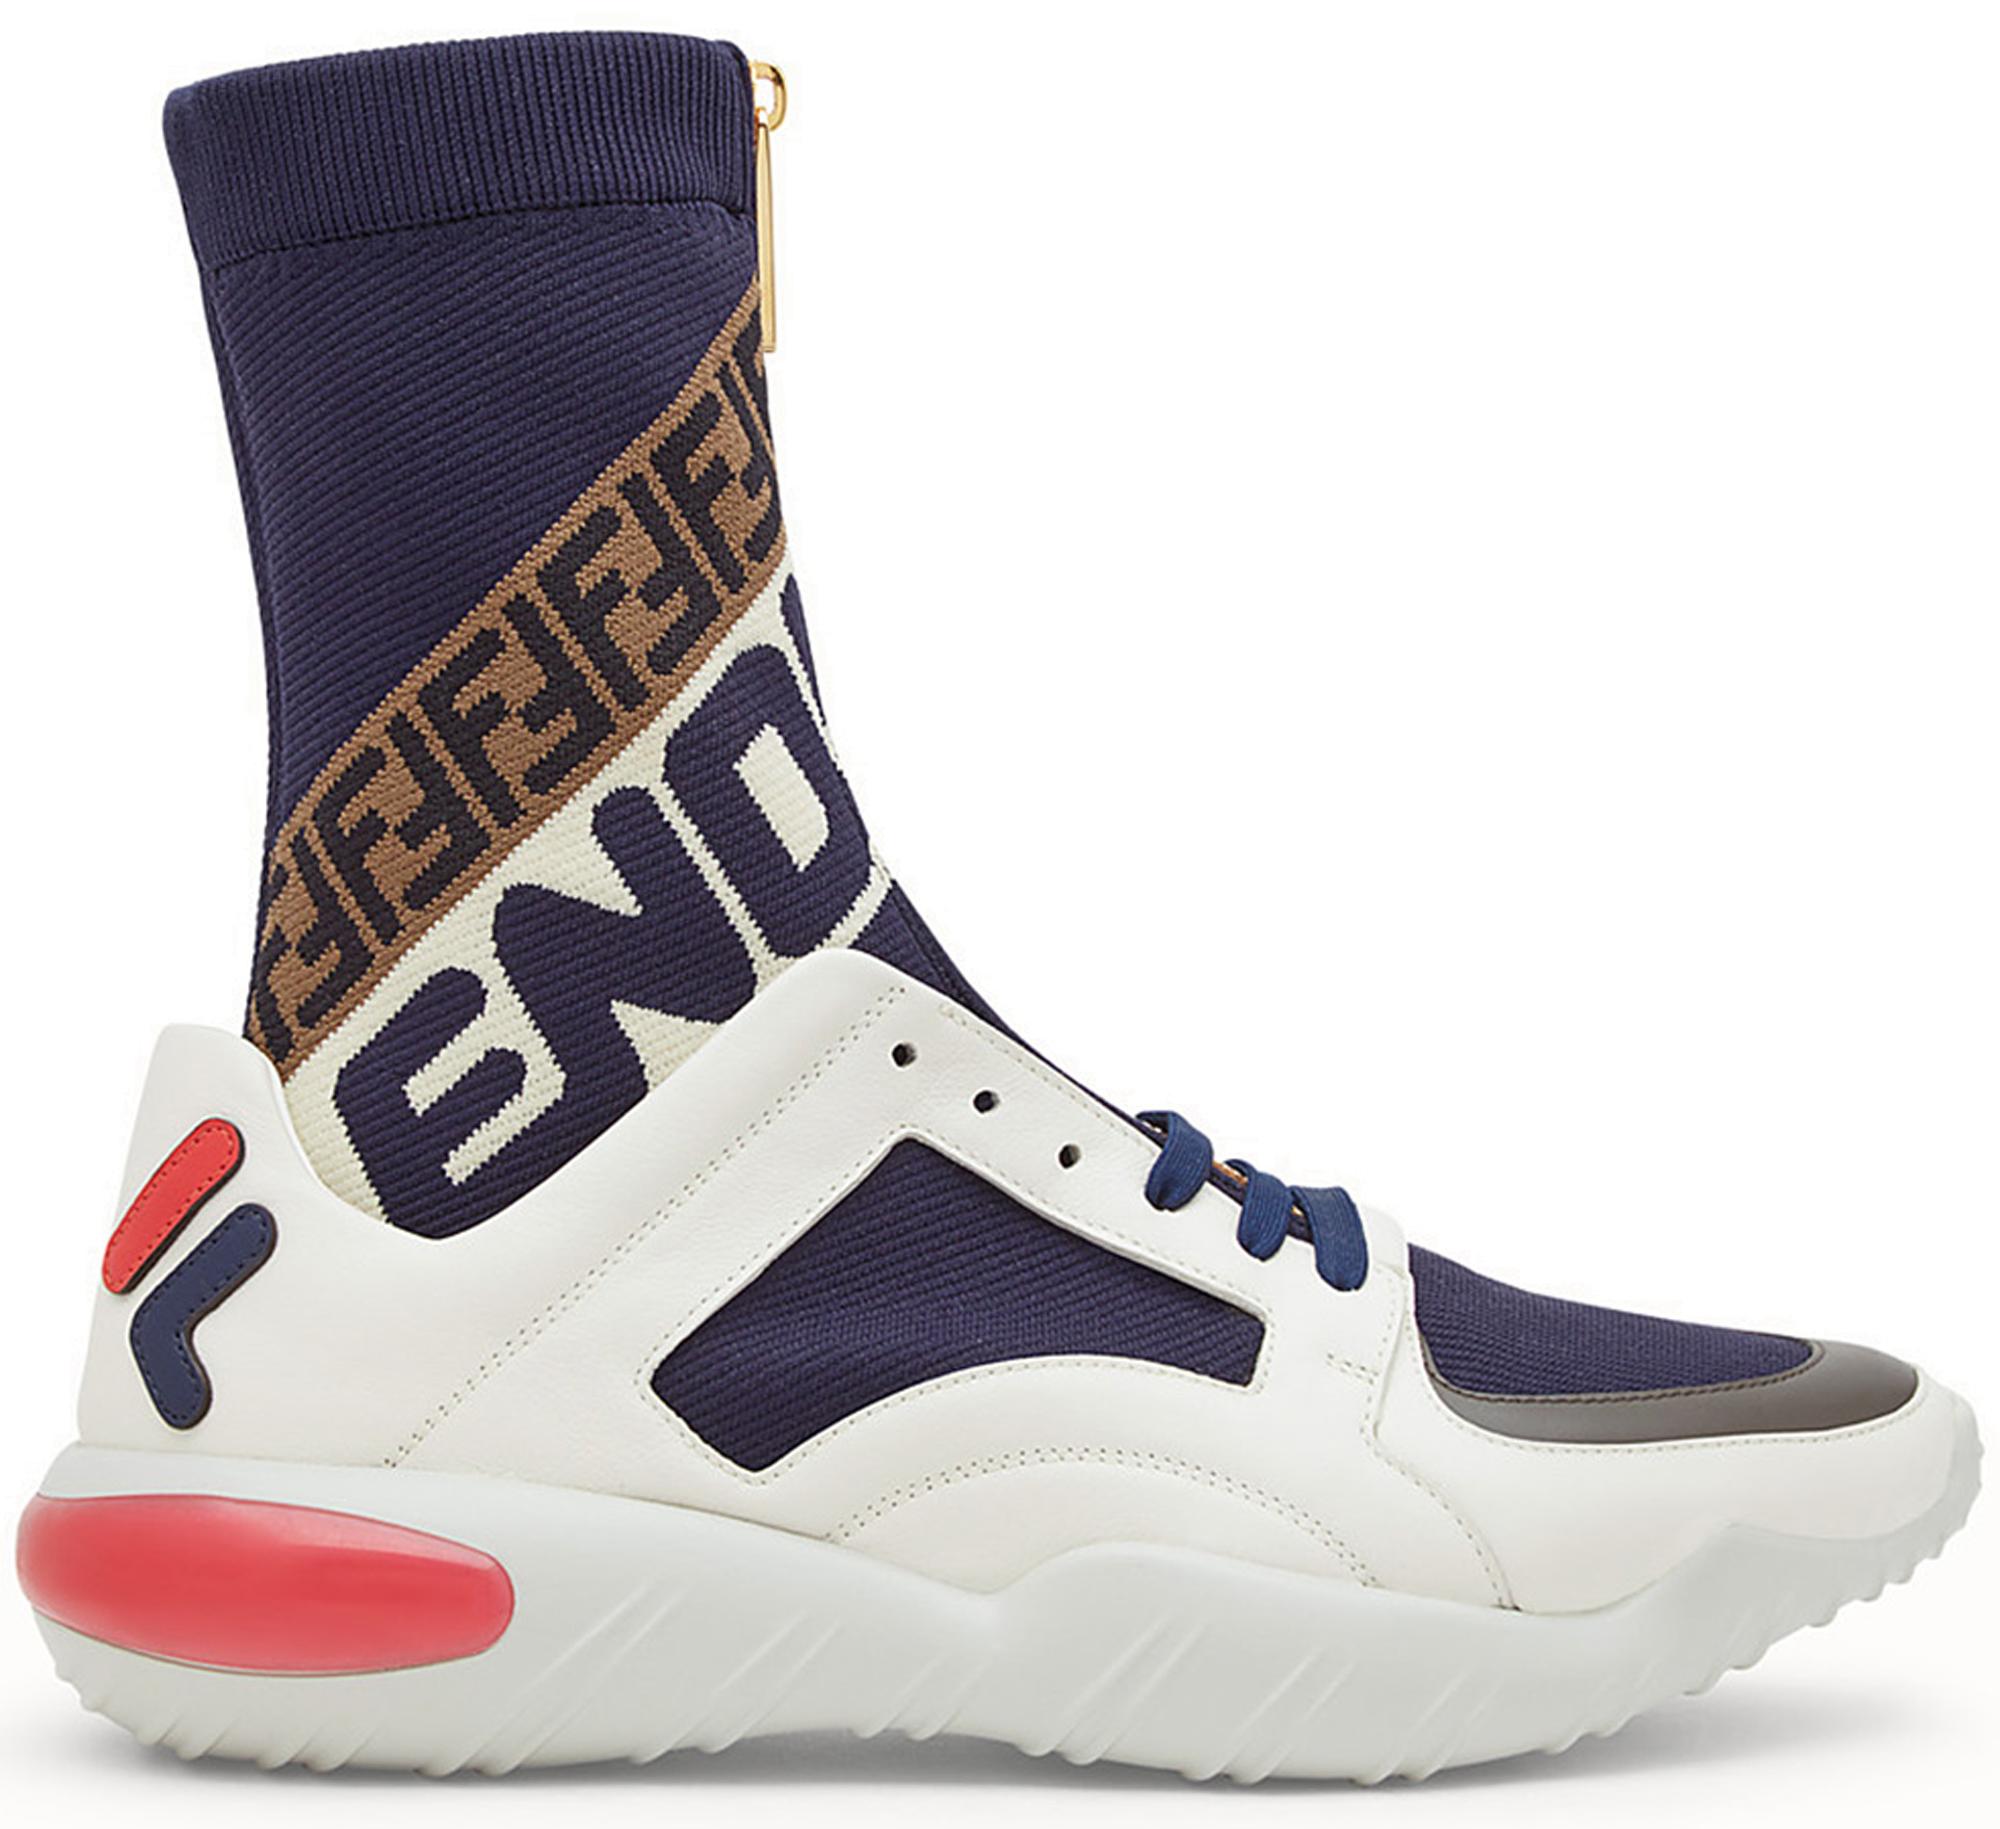 fendi sneakers high top